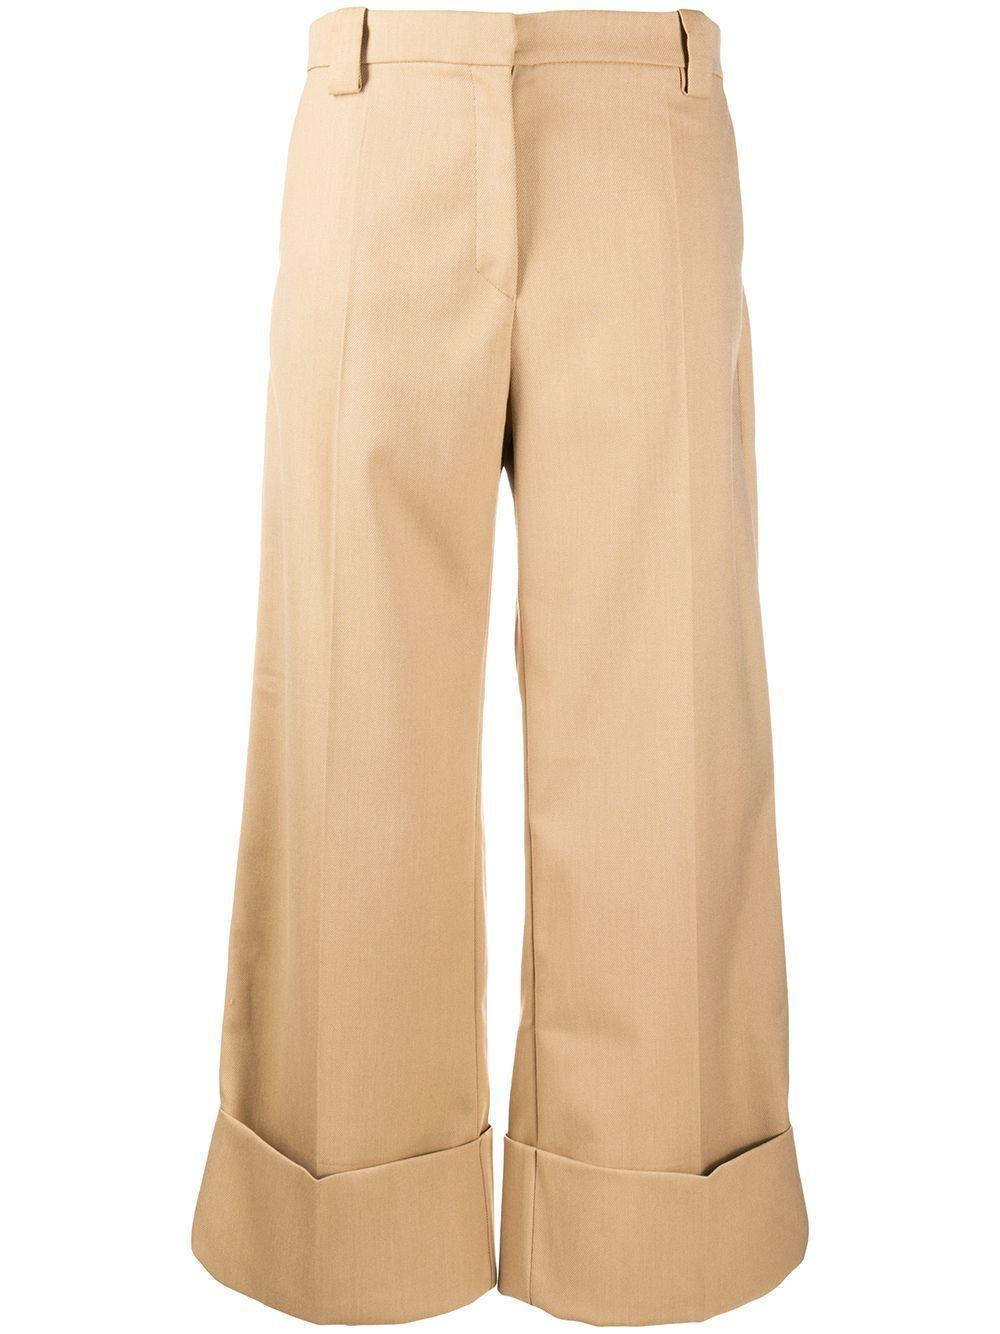 Nayla Cropped Cuffed Pant Item # 21197